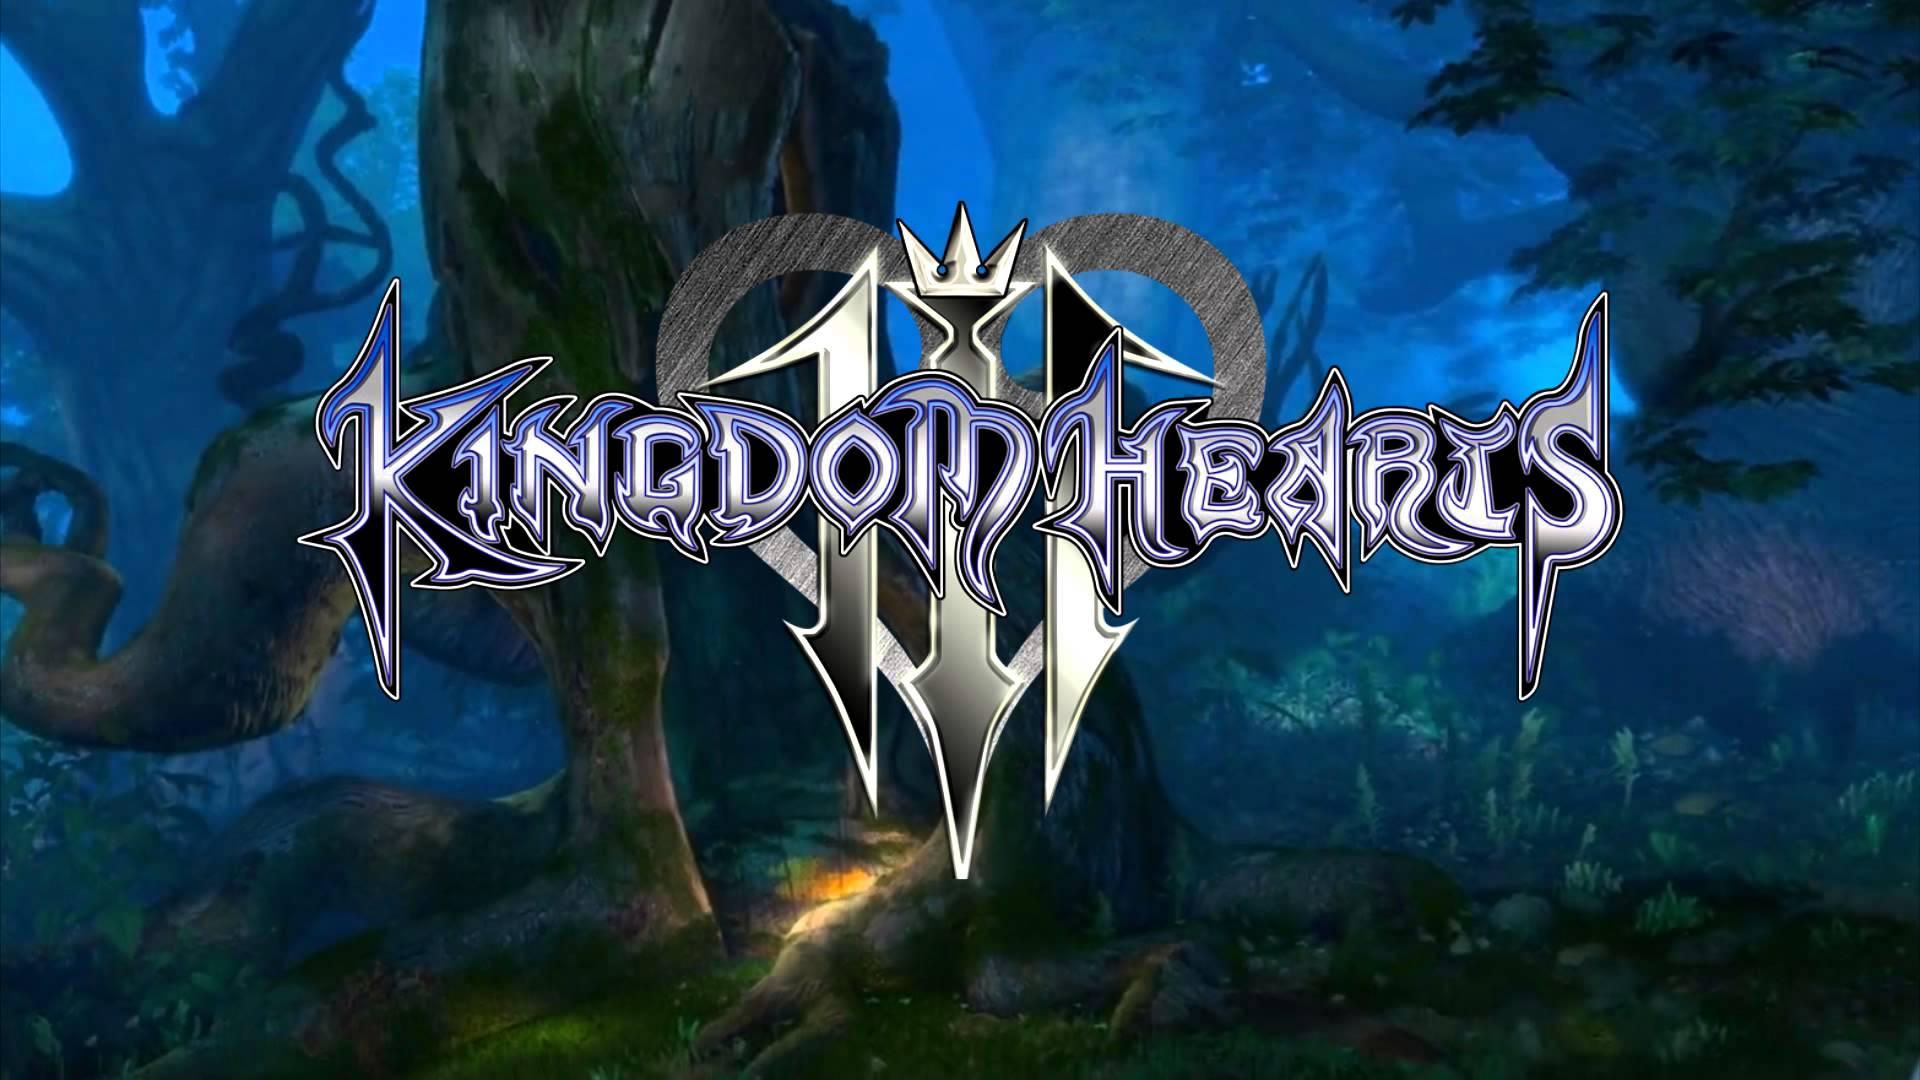 kingdom hearts 3 logo wallpaper 67179